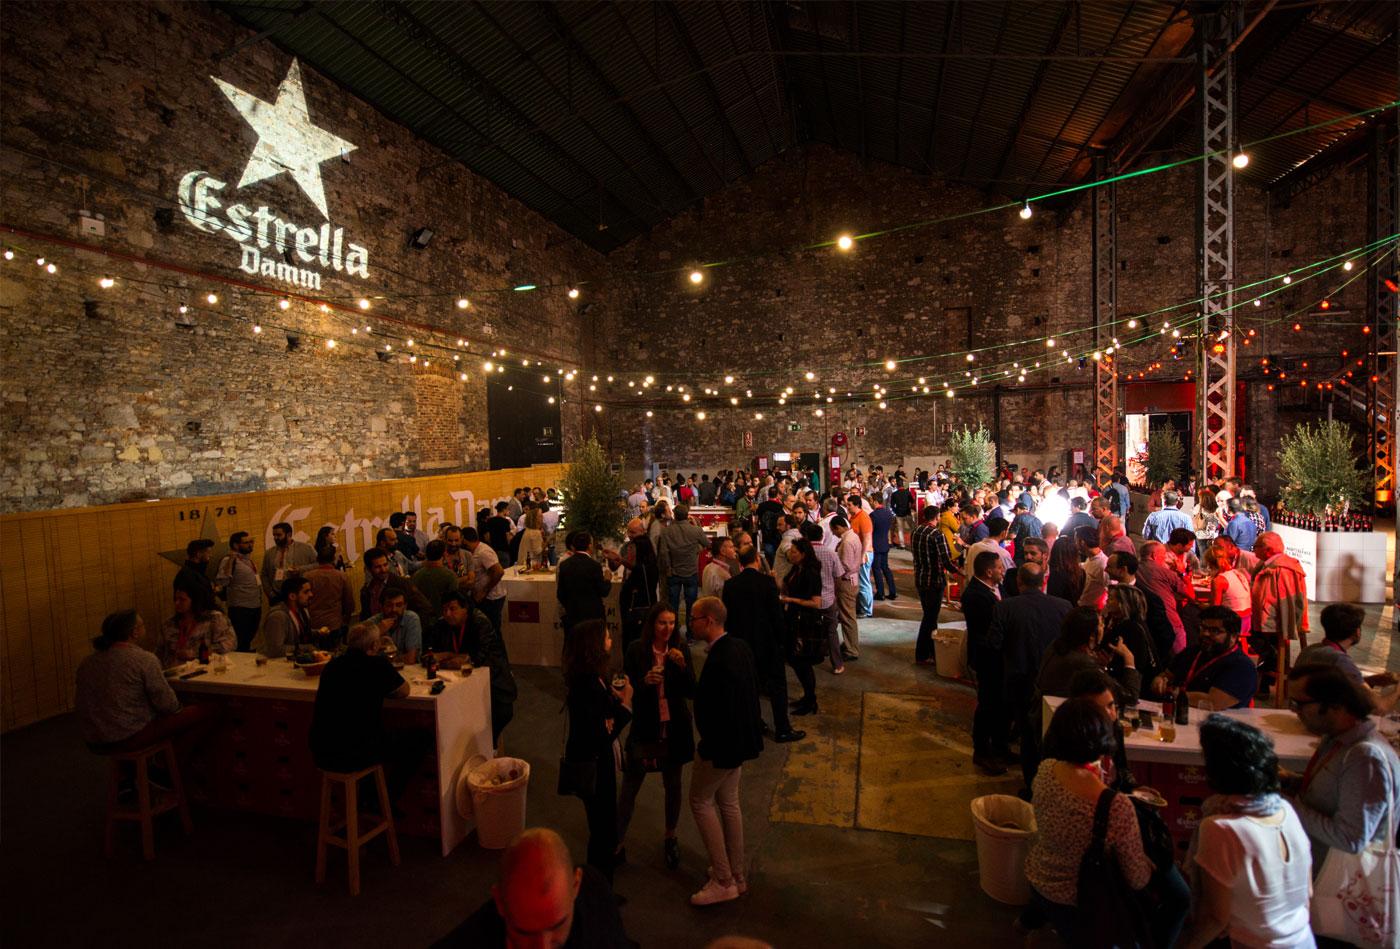 estrella-damm-gastronomy-congress-2017